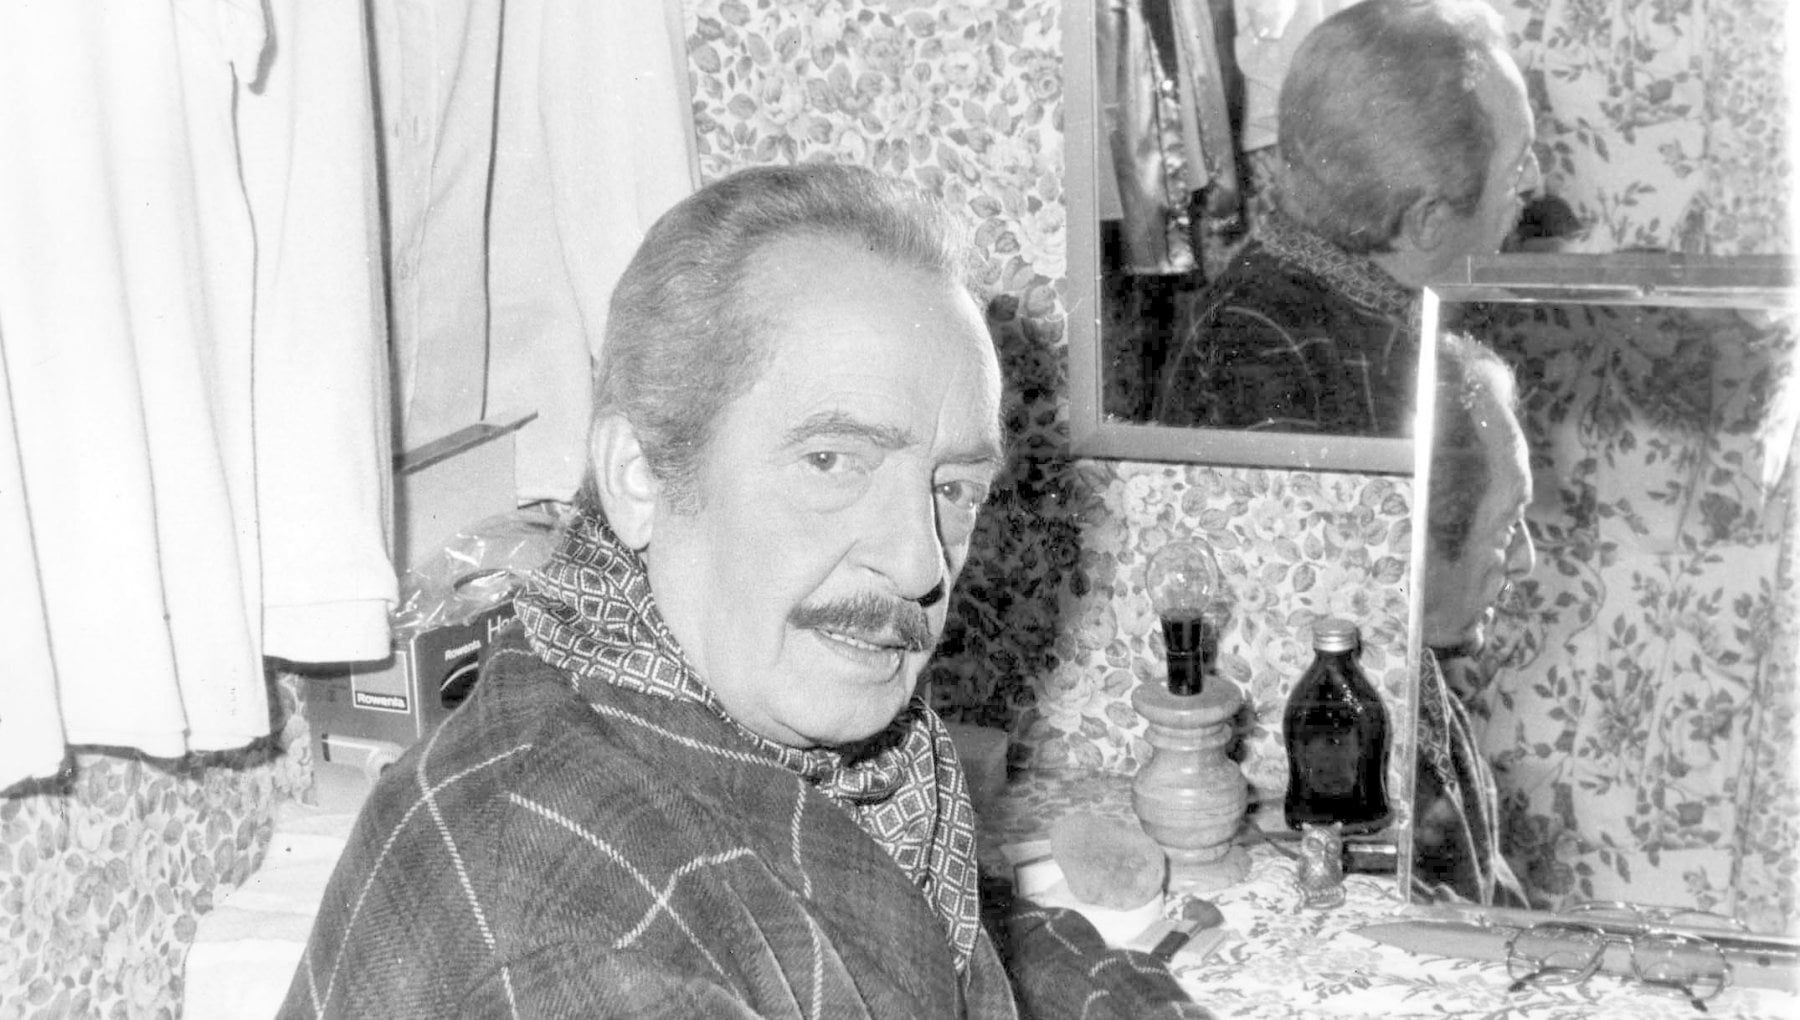 Nino Taranto, la nobile spalla: la tv rende omaggio a un campione del teatro